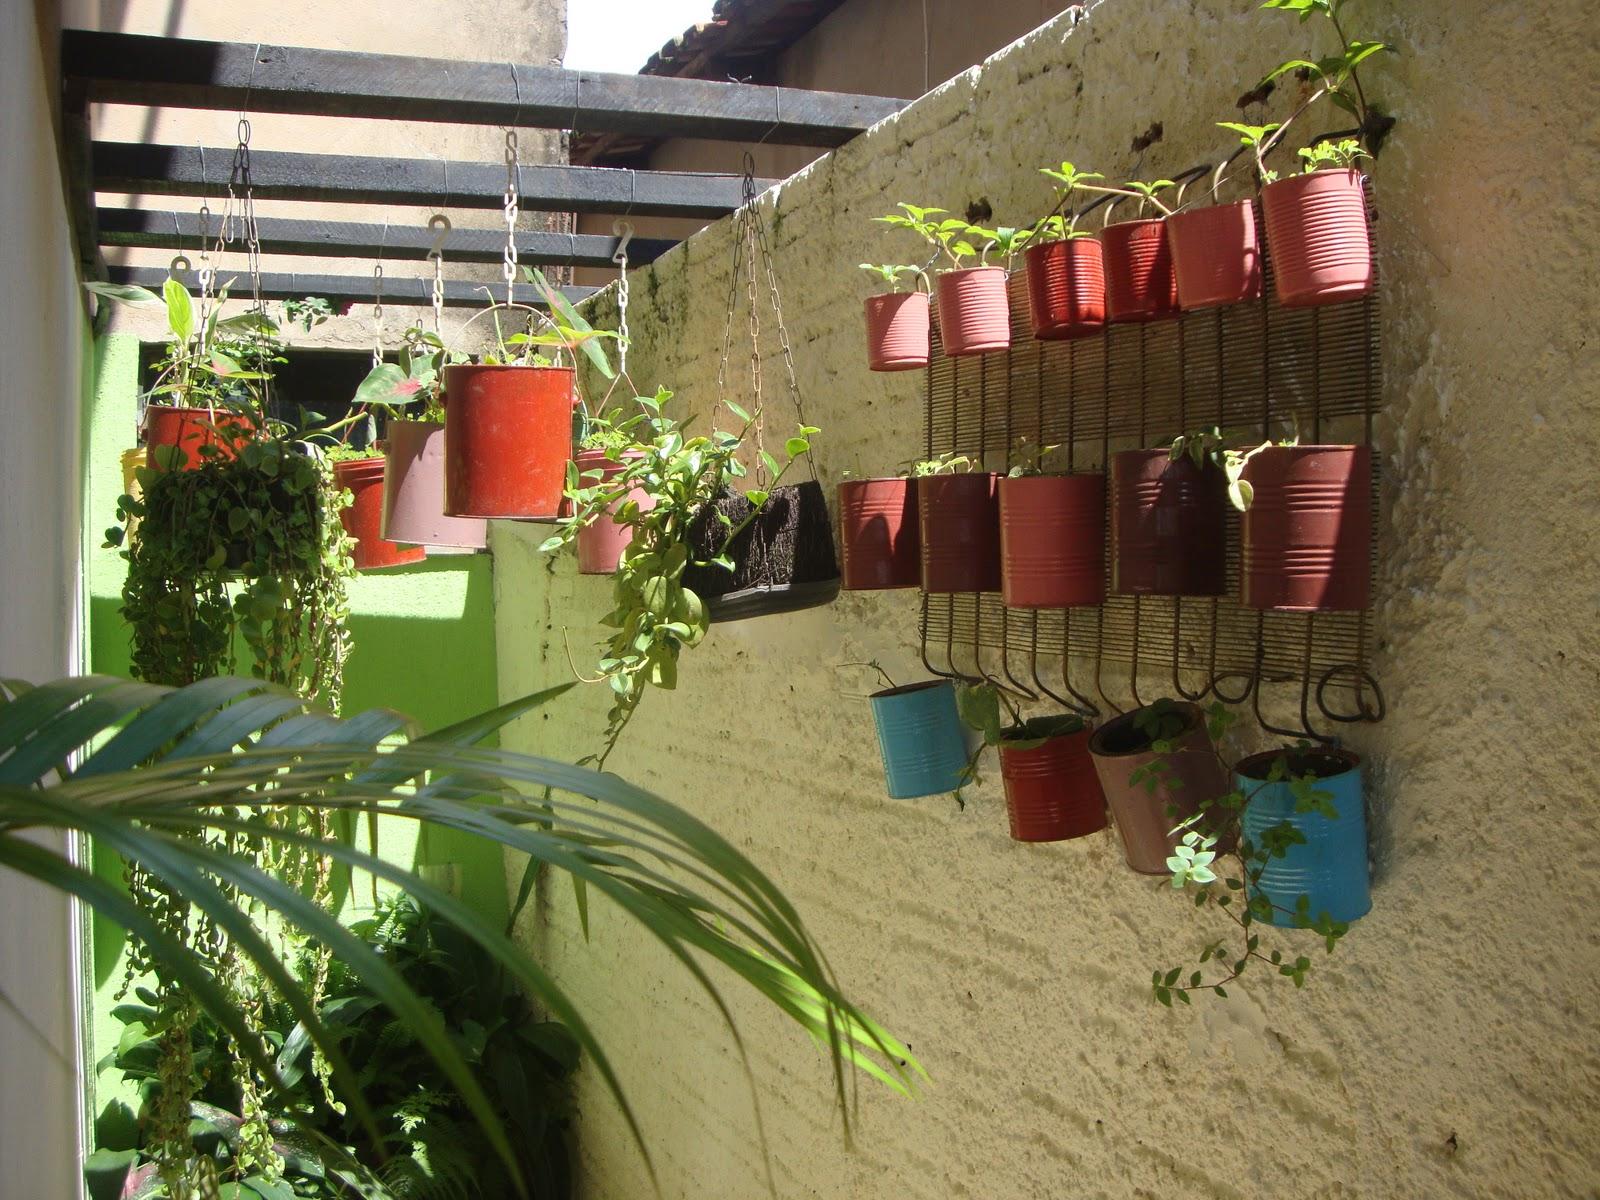 jardim vertical latas : jardim vertical latas:17 47 marcadores bambus jardim vertical latas muros reciclagem